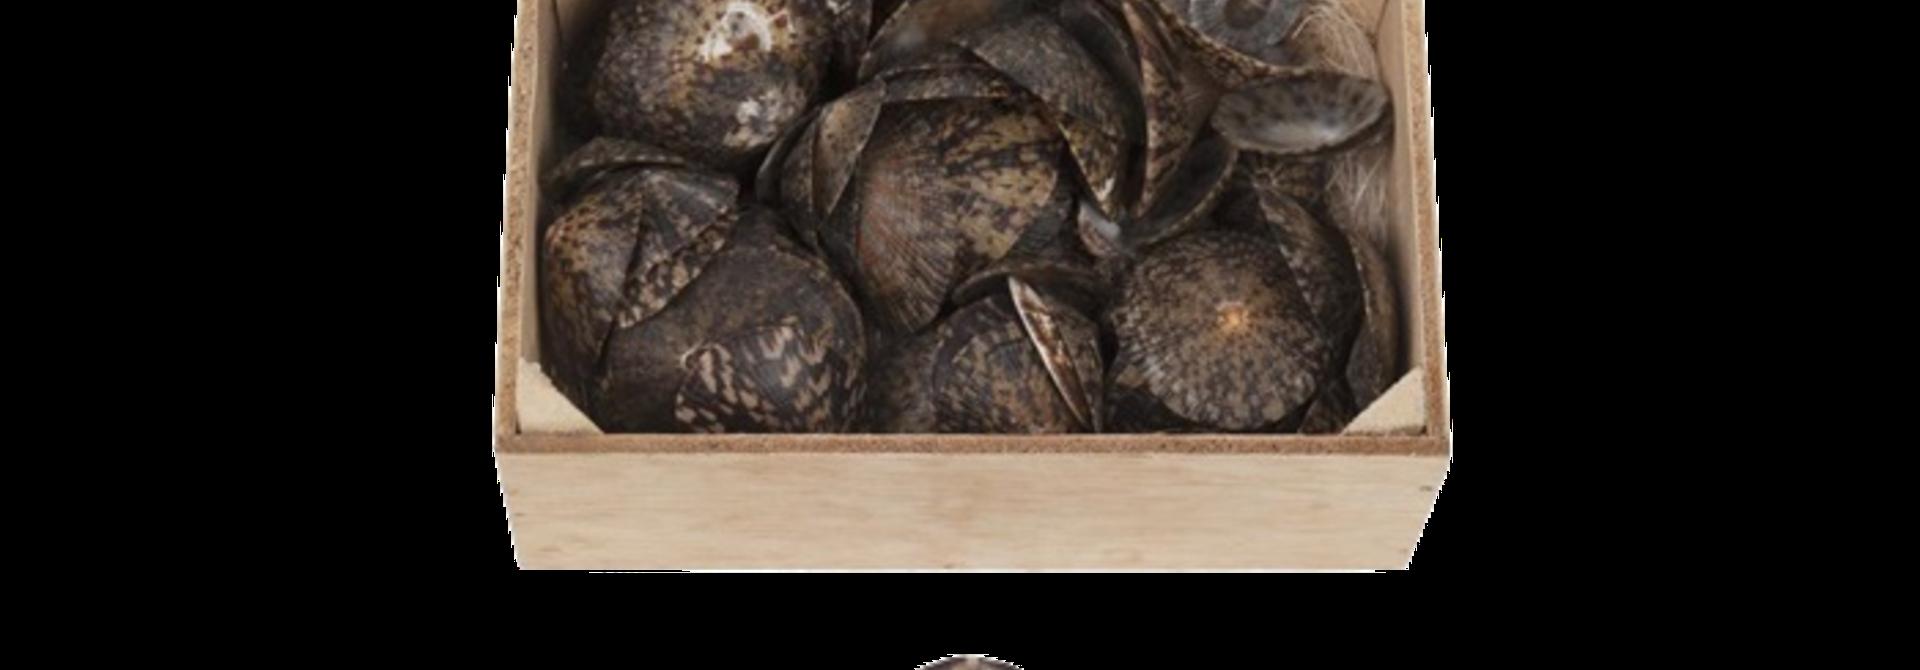 Casket oval limpet Shells